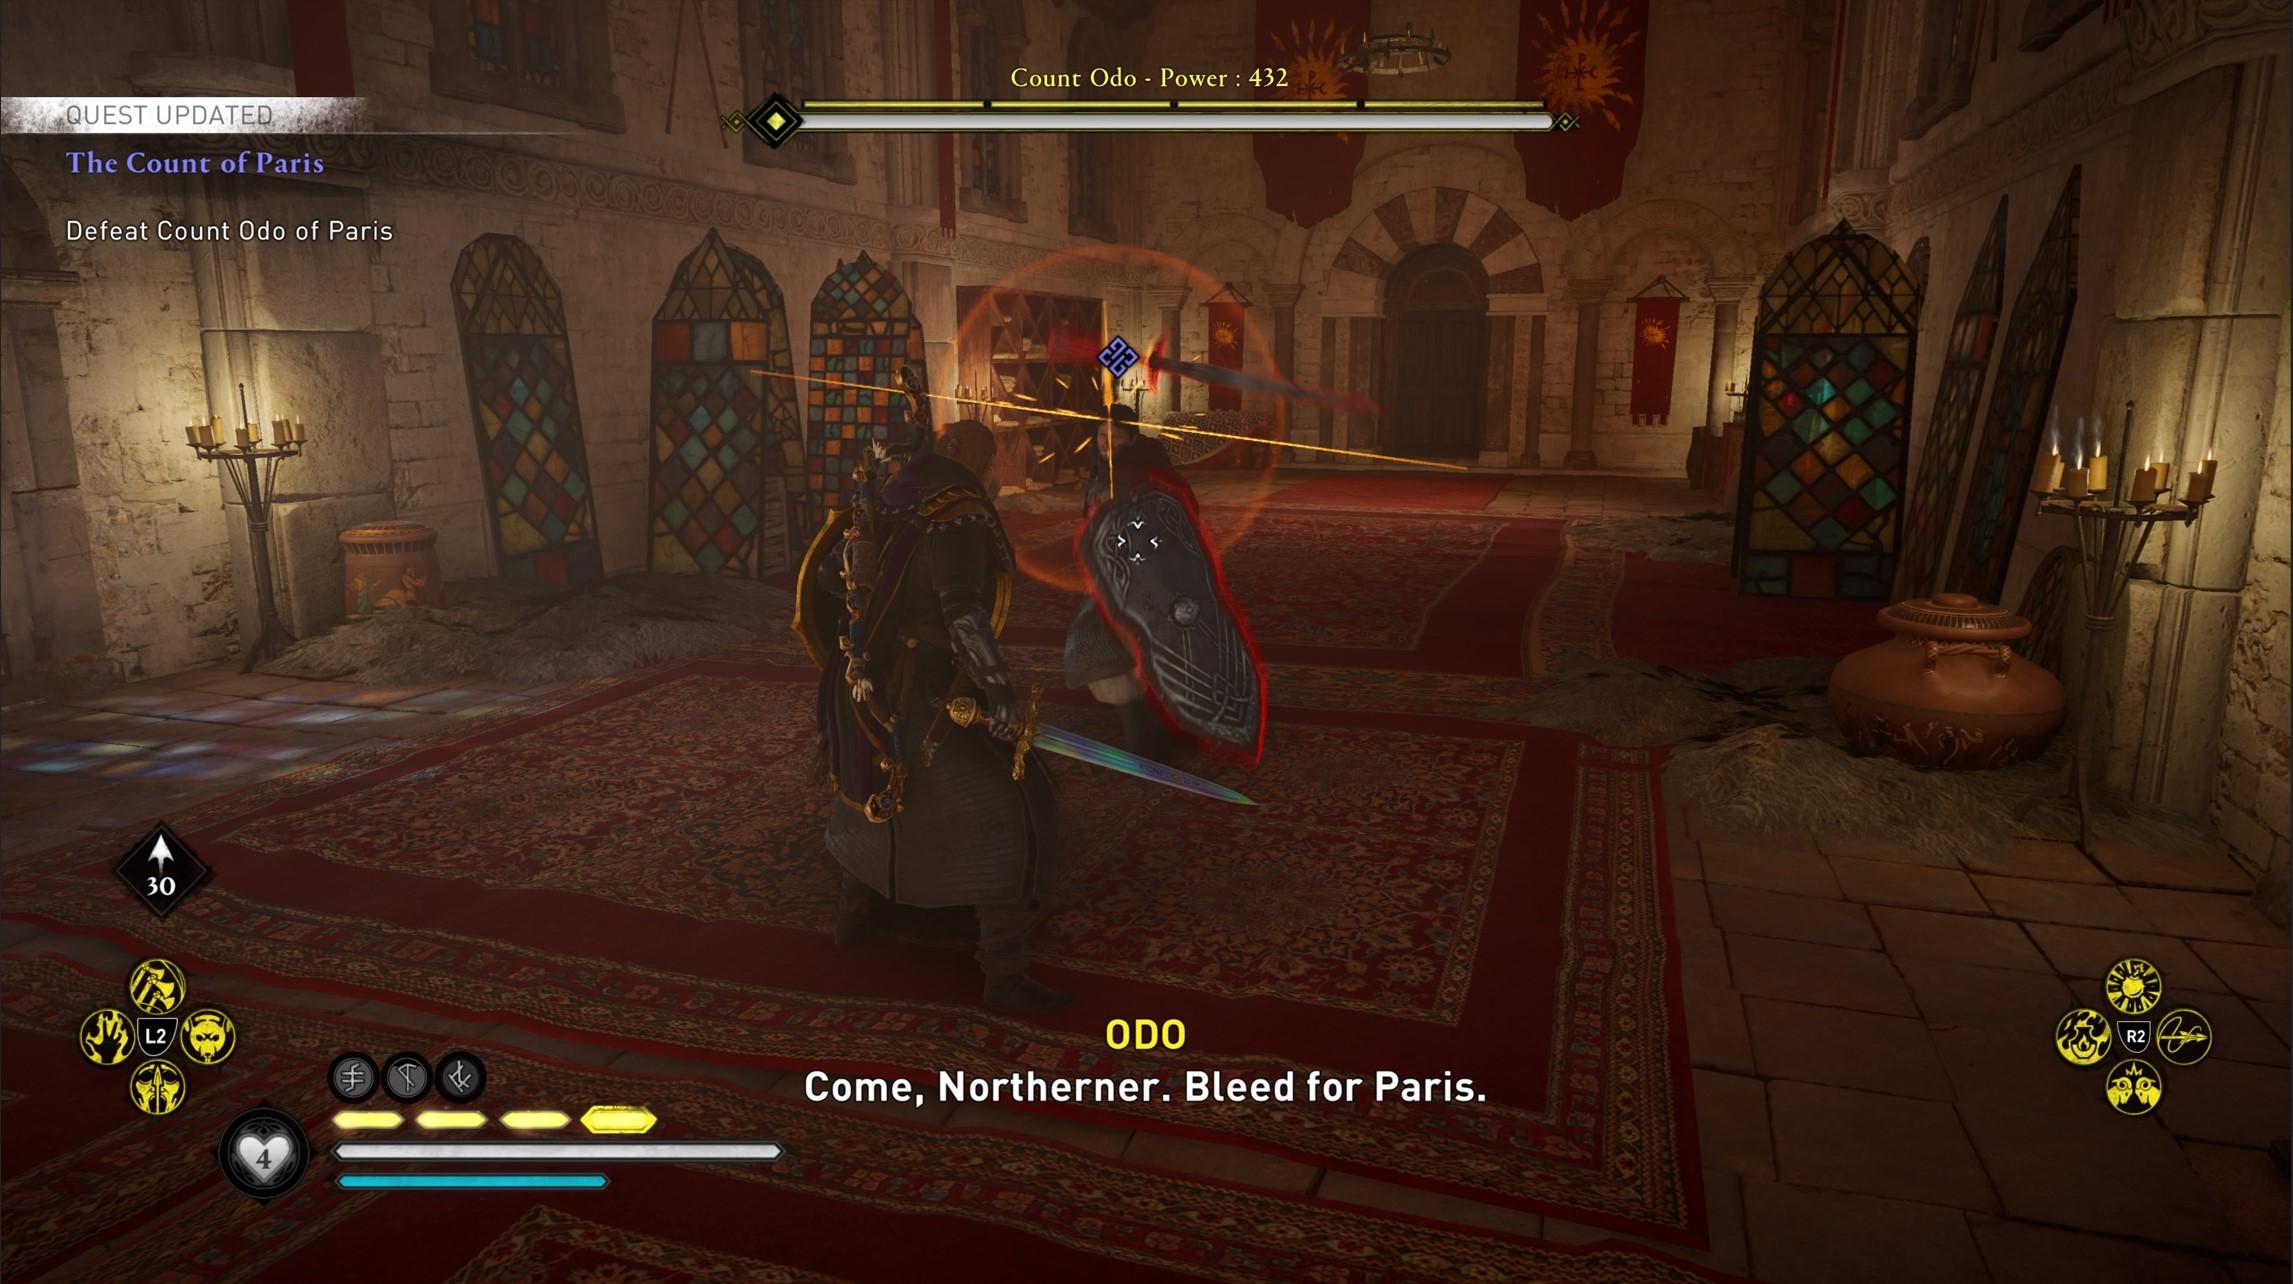 assassins creed valhalla count of paris odo boss Assassin's Creed Valhalla Siege of Paris The Count of Paris | Confront Odo